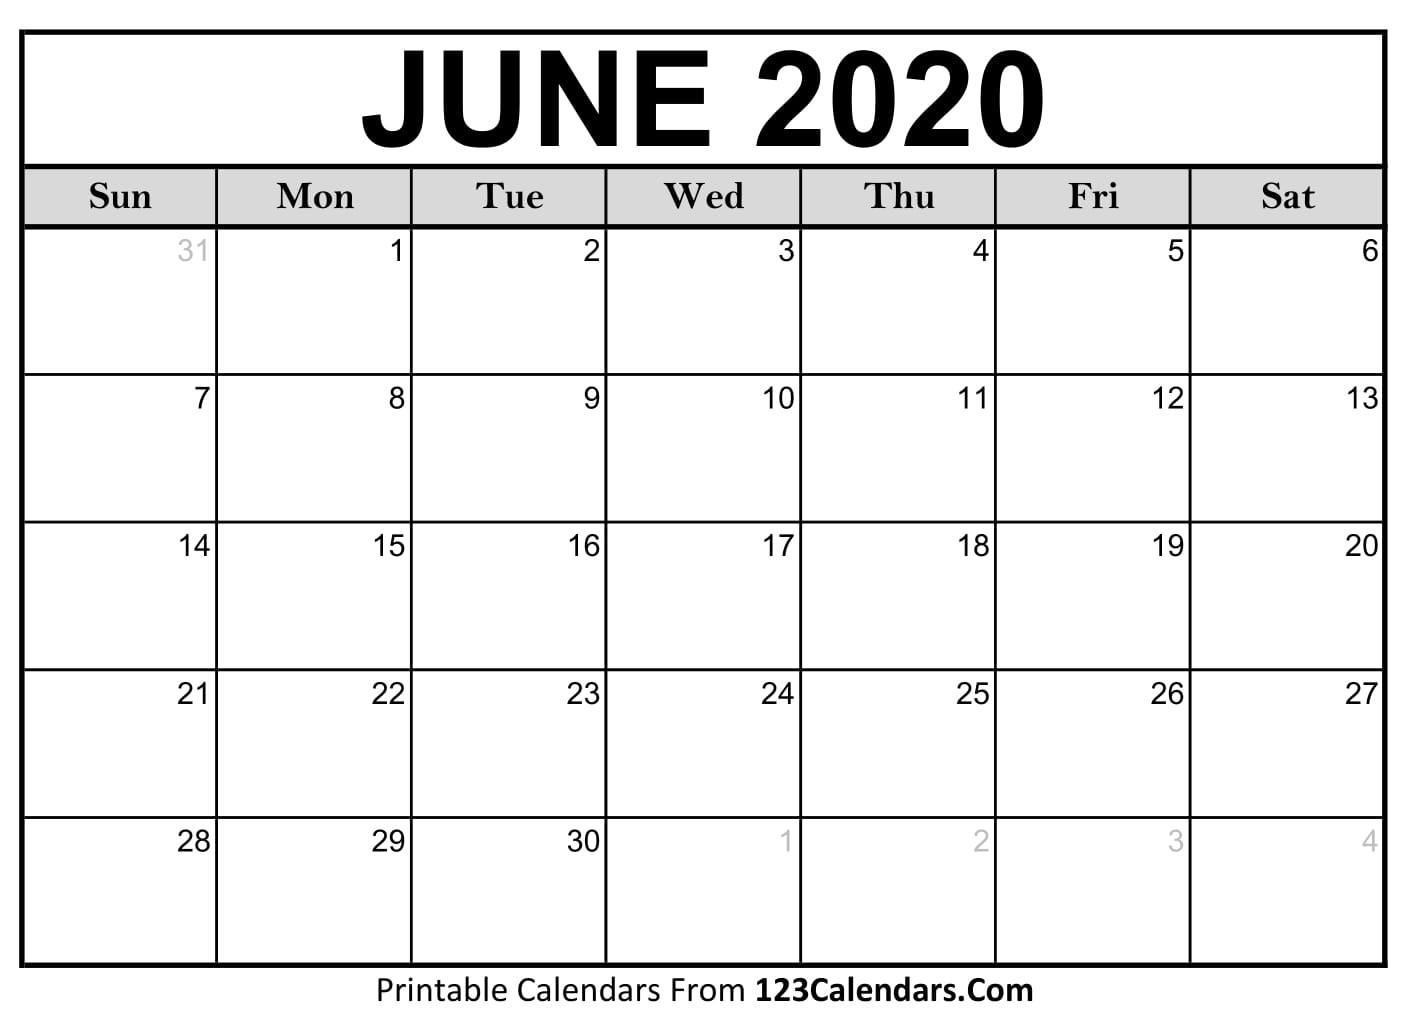 June 2020 Printable Calendar   123Calendars-June July 2020 Monthly